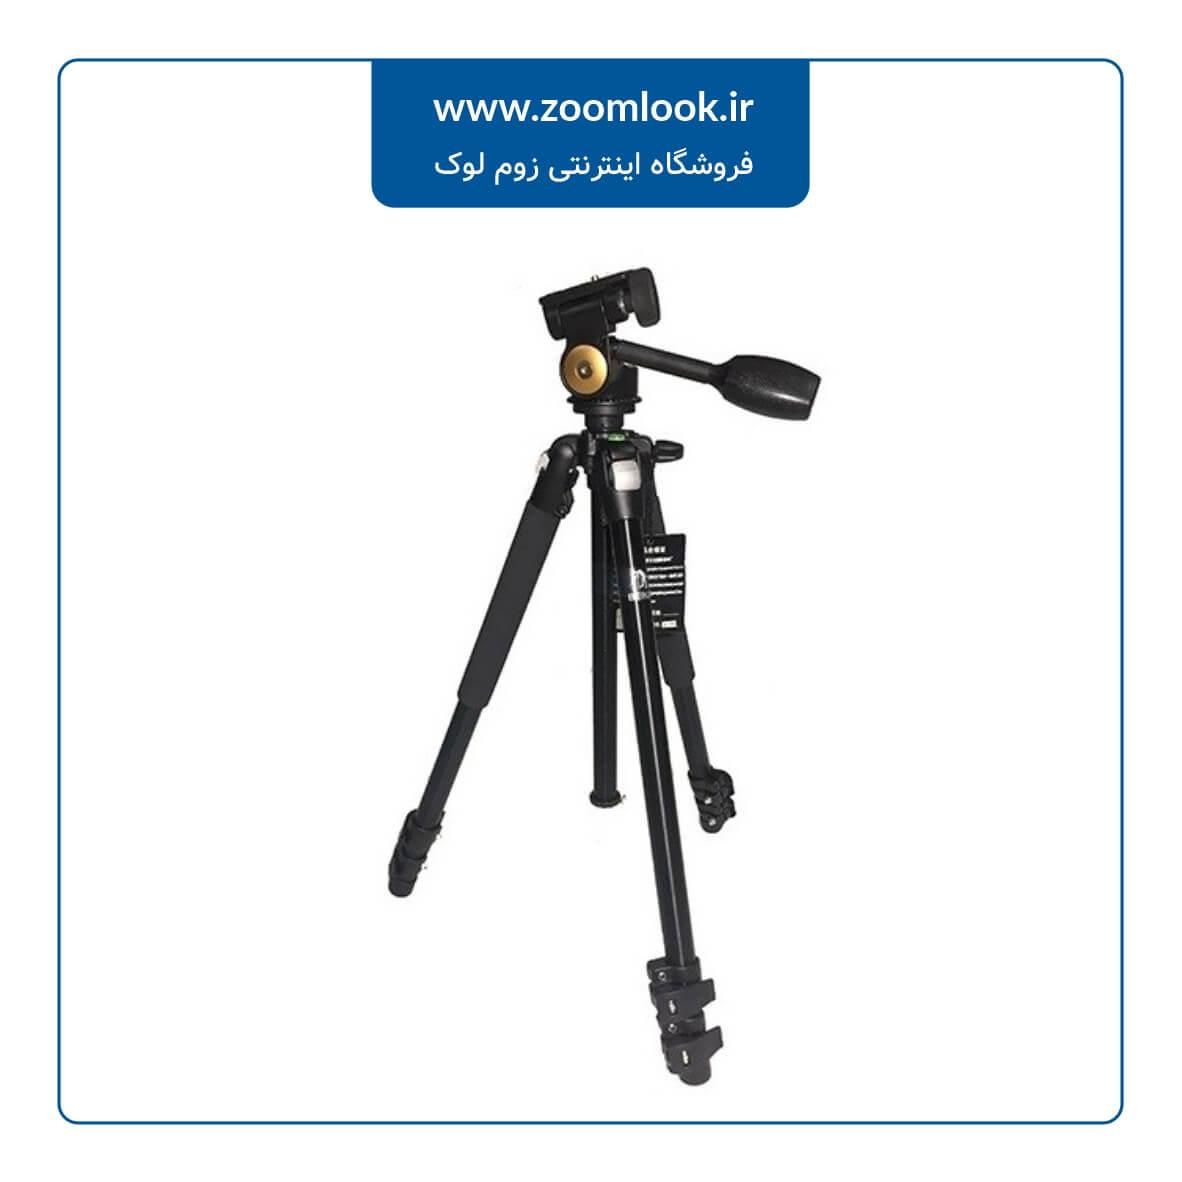 سه پایه دوربین بیک BEIKE BK-304